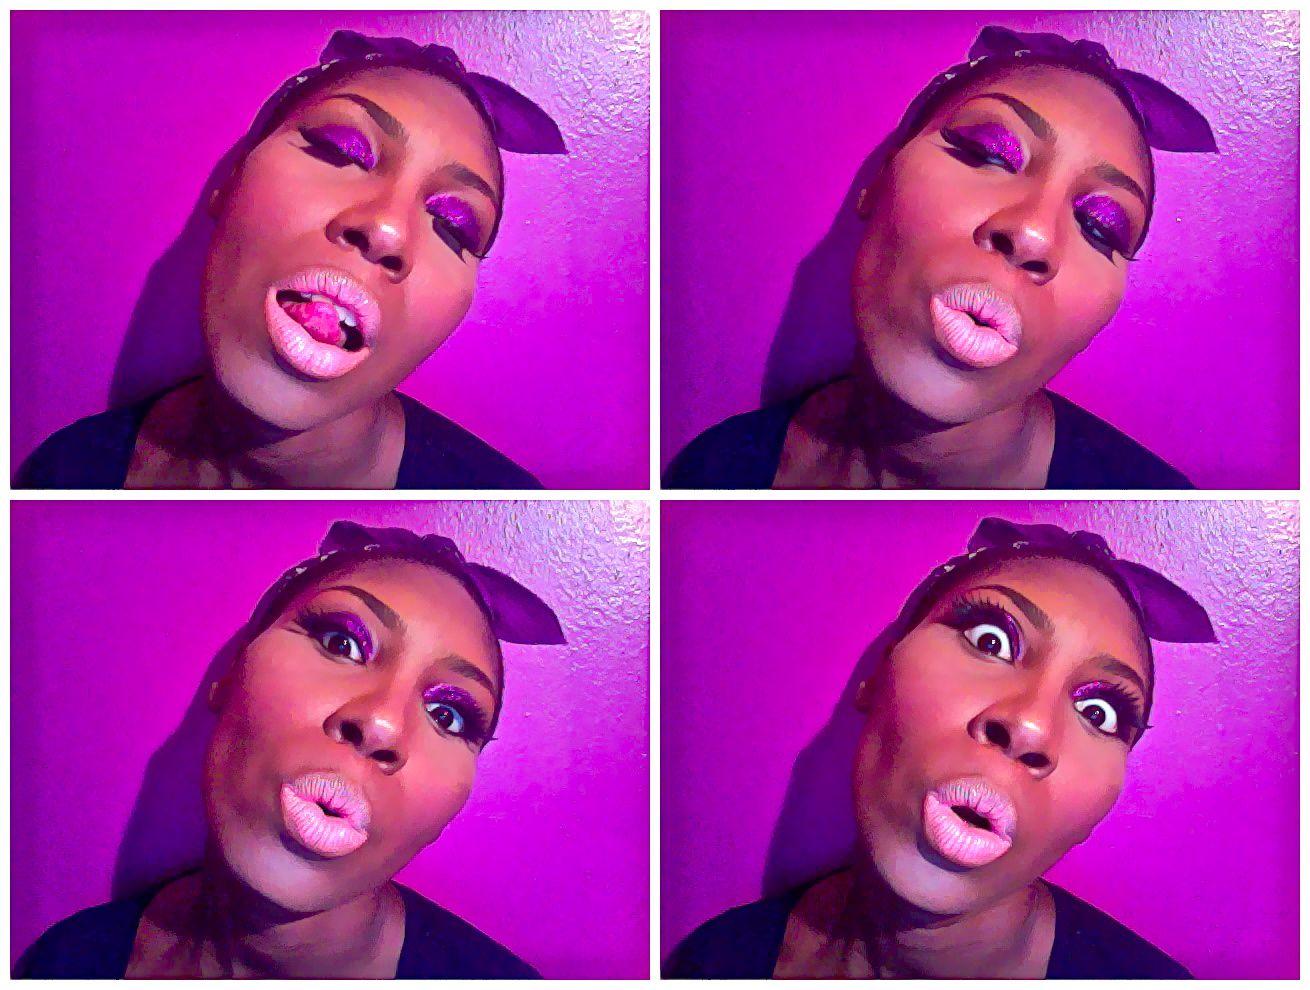 Nicki Minaj *I AM YOUR LEADER* A preview of the